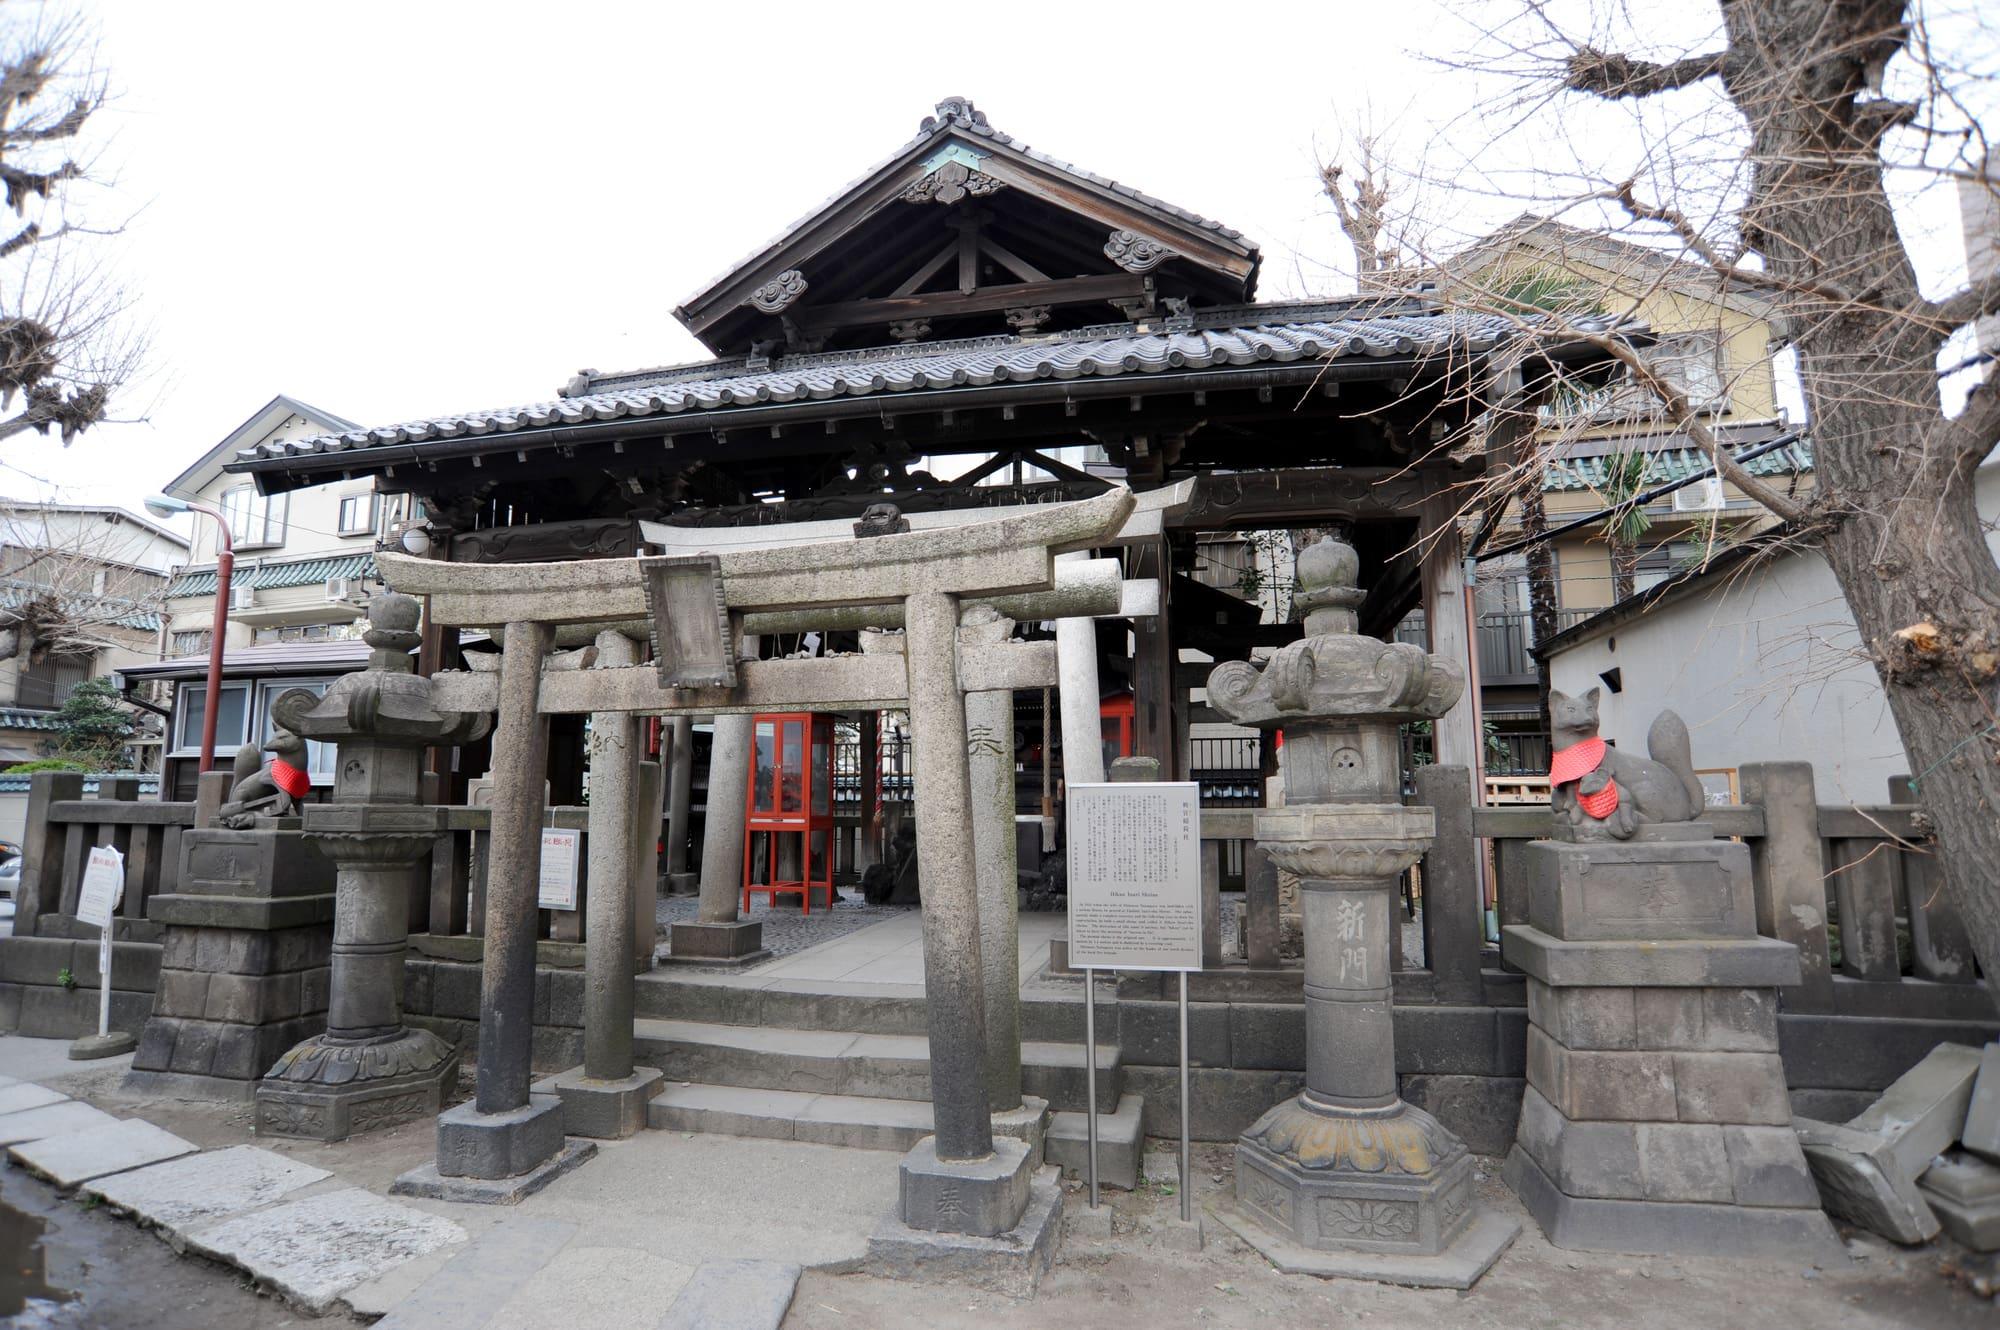 Hikan Inari Shrine in Asakusa Shrine